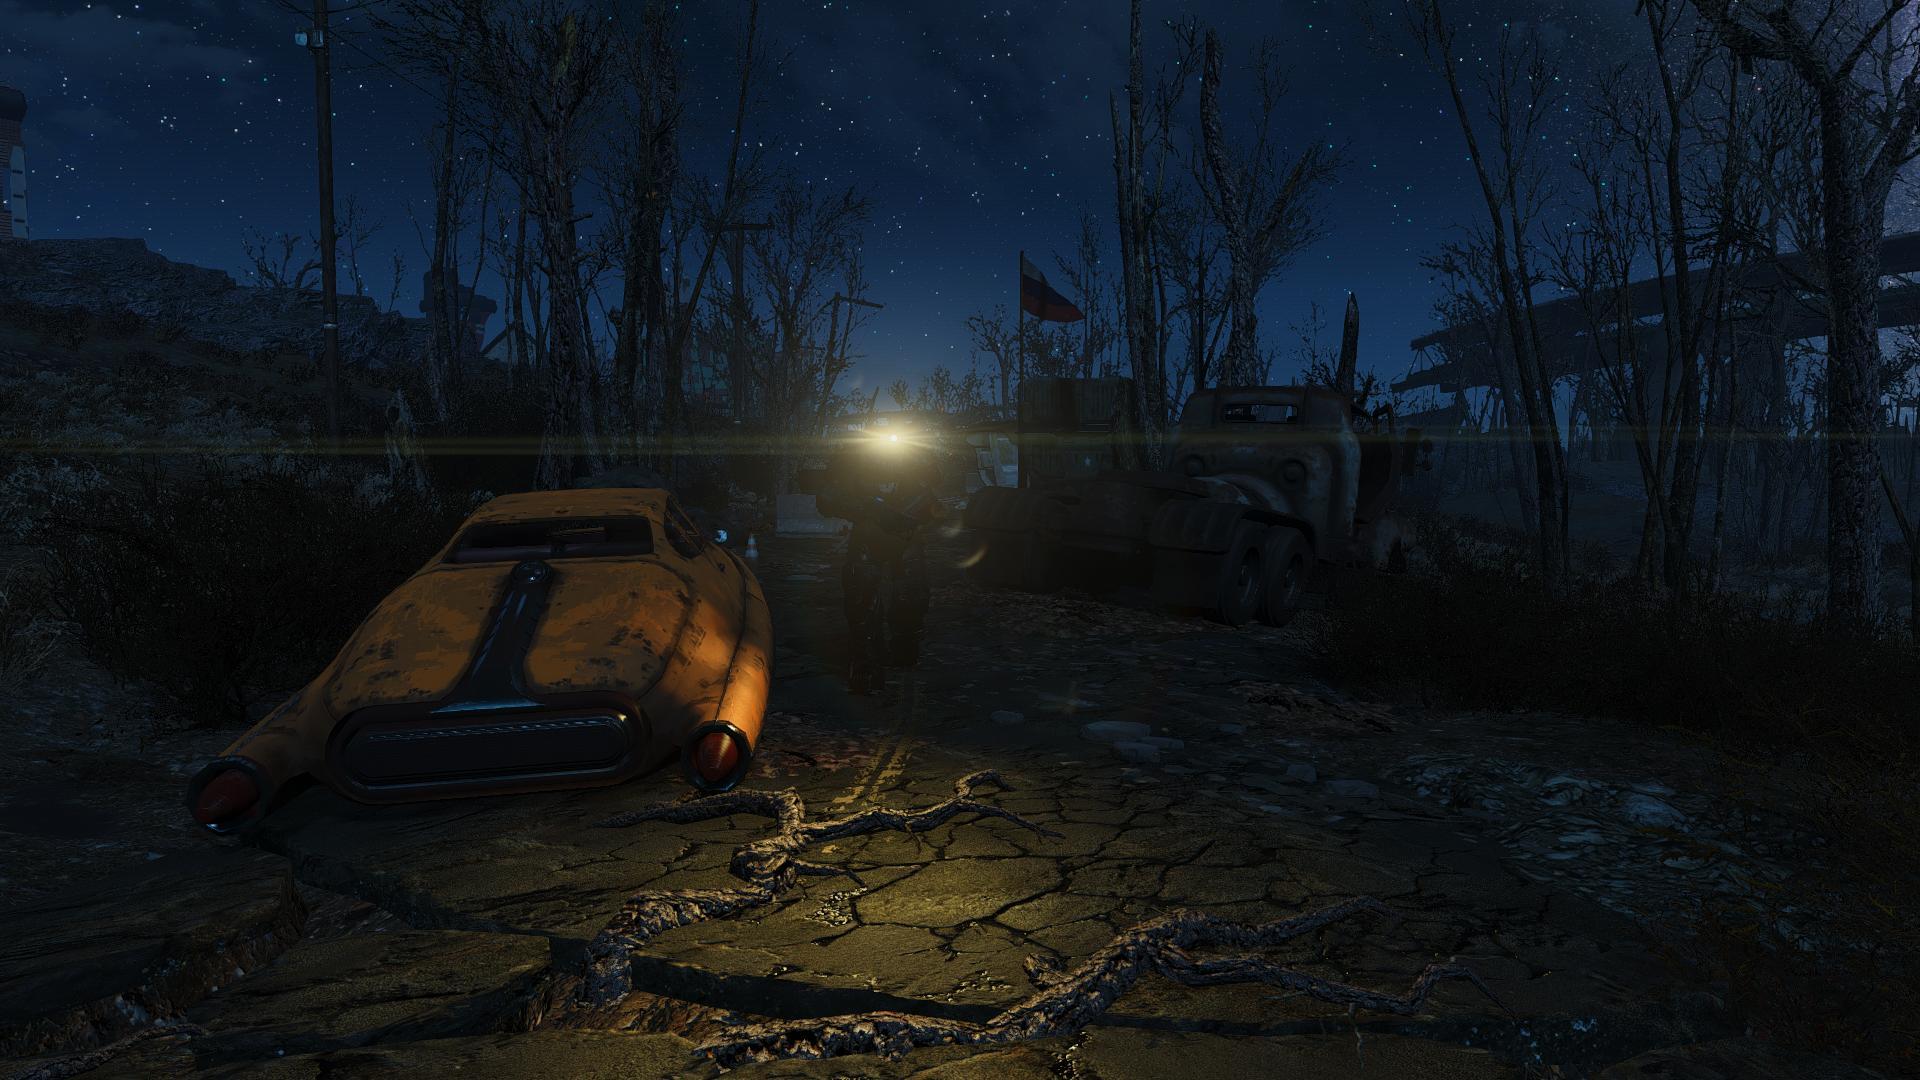 000464.Jpg - Fallout 4